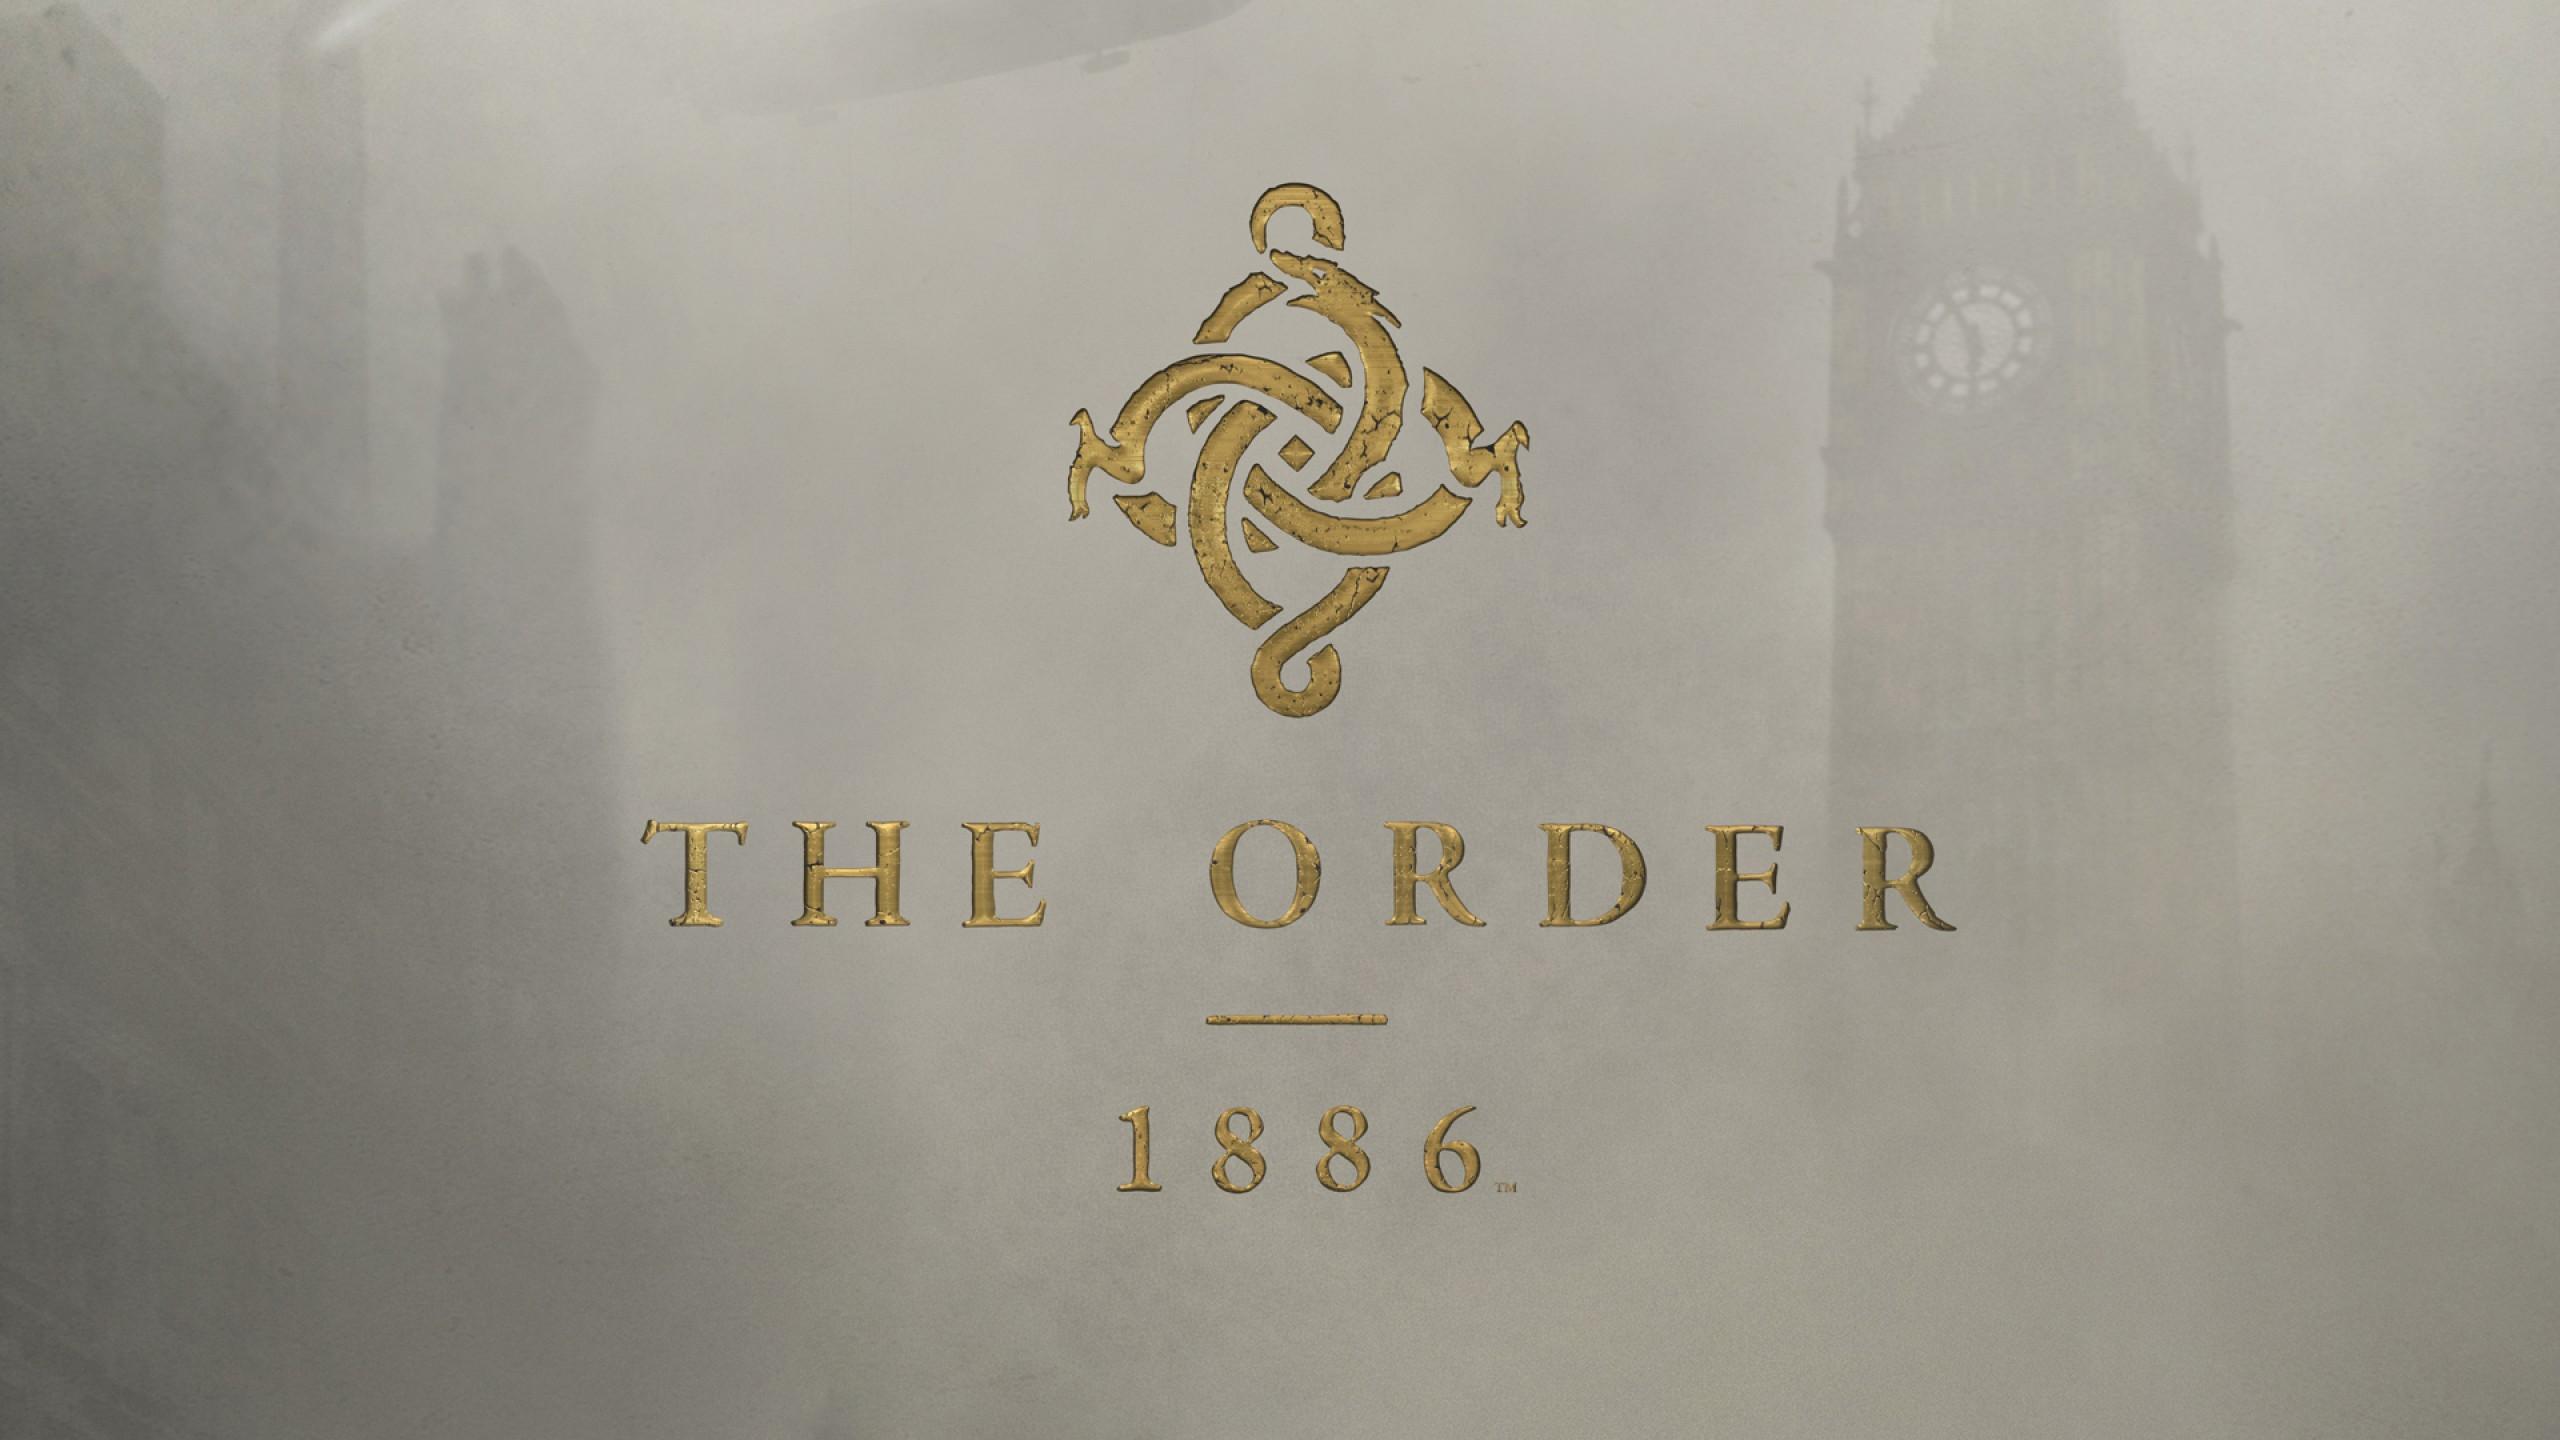 the-order-1886 logo